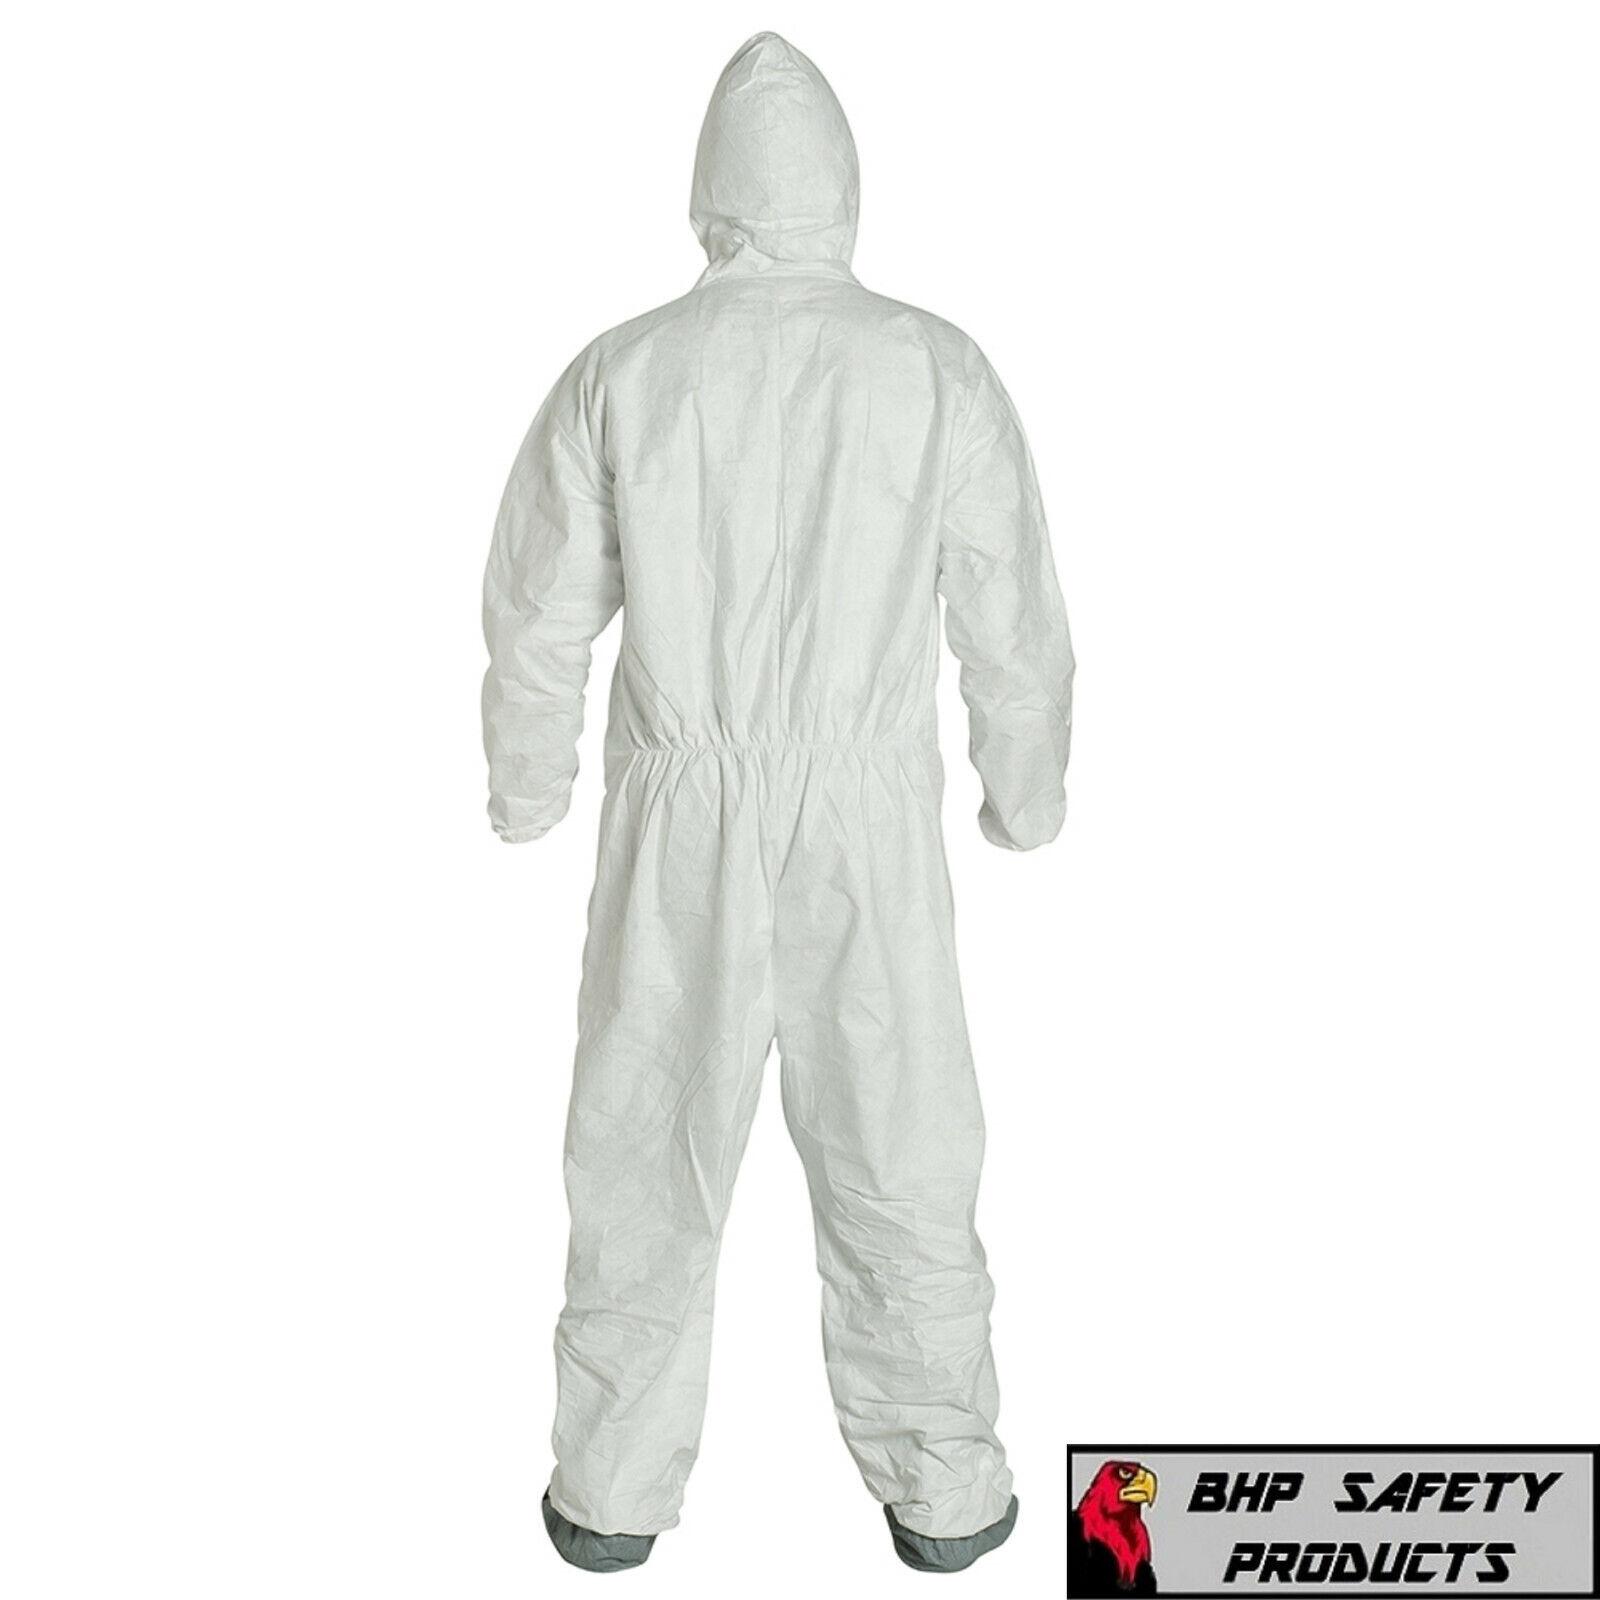 25//Case Hood /& Bottes DuPont Tyvek 400 Blanc Combinaison TY122SWH-3XL